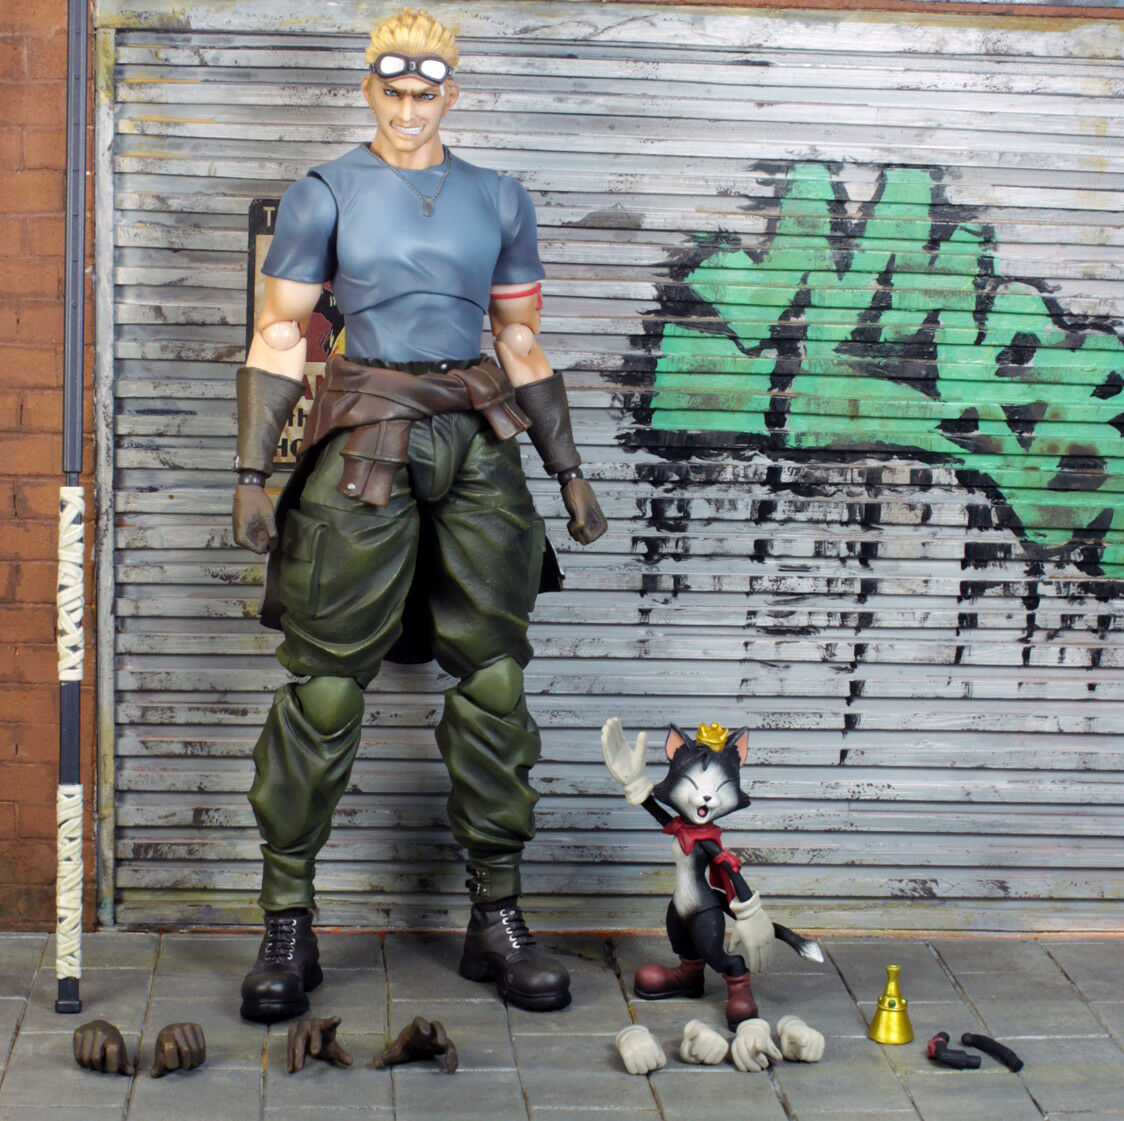 Final Fantasy VII Cid Highwind & Cait Sith Play Arts Kai Action Figure NO BOX